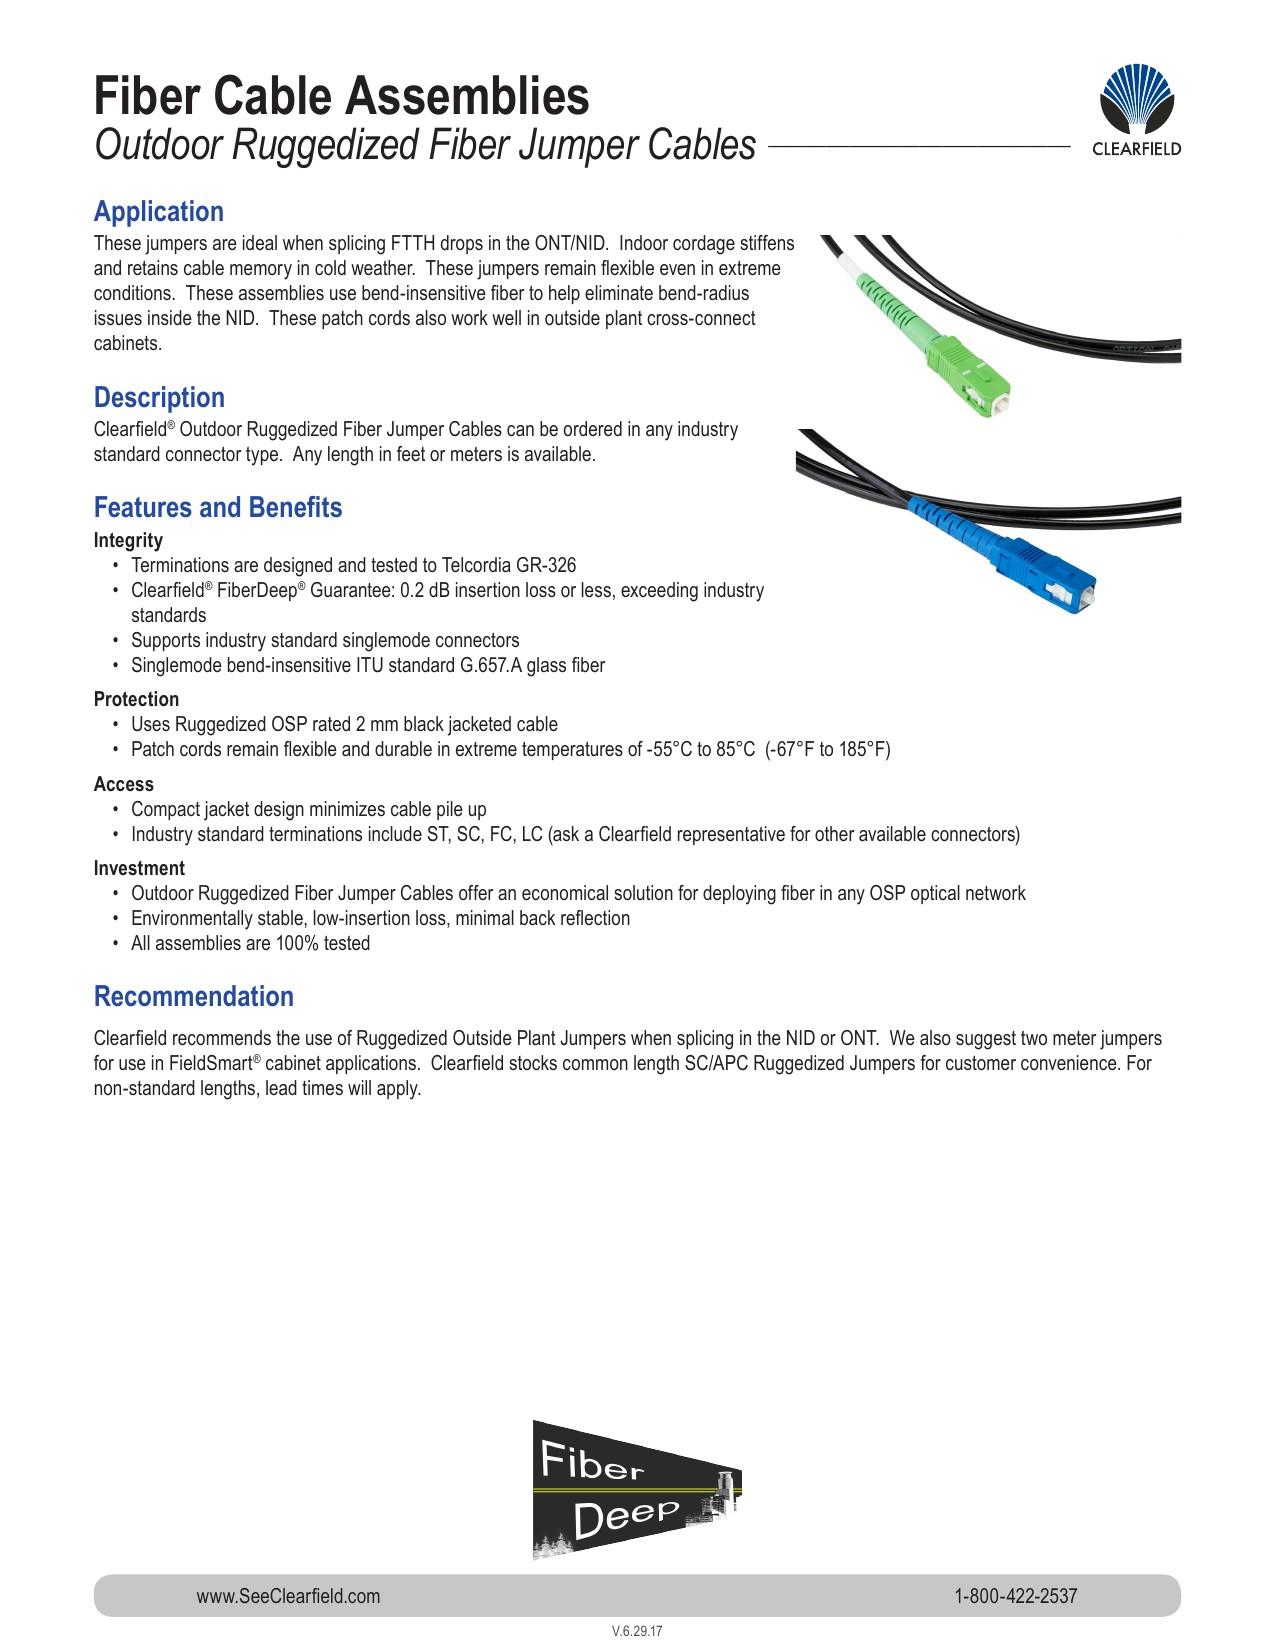 Jumper Cable Connection Diagram Fiber Cable assemblies Of Jumper Cable Connection Diagram